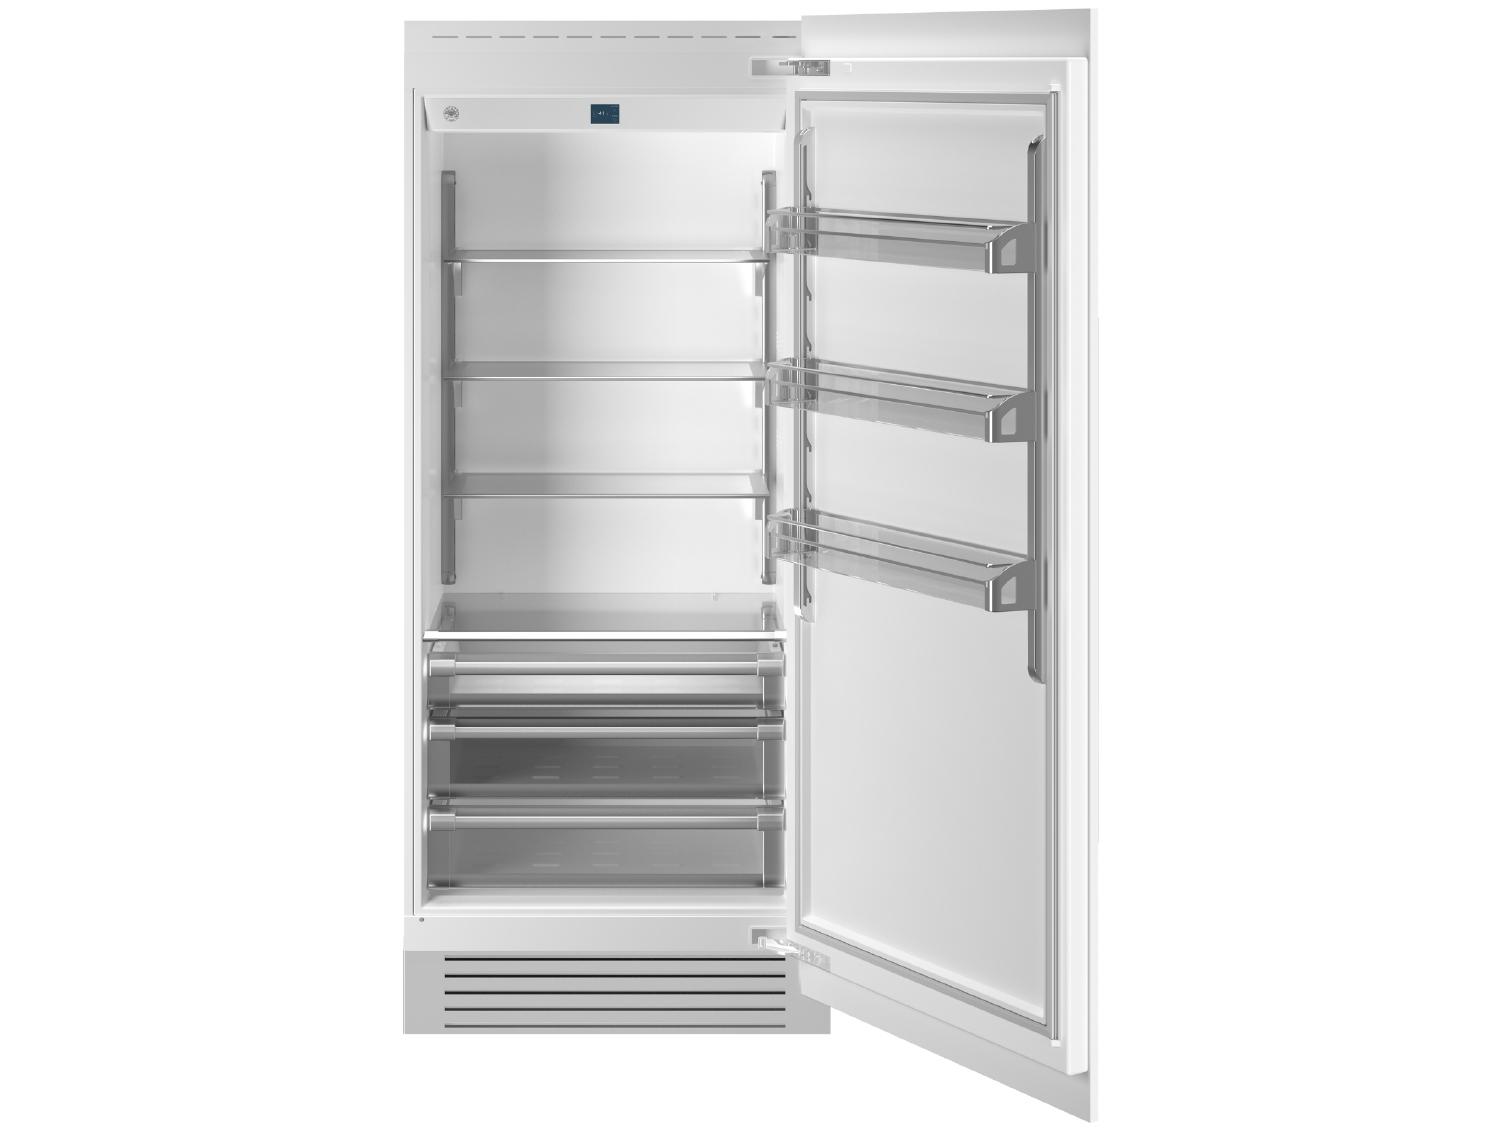 "Bertazzoni 36"" Built-in Refrigerator column - Panel Ready - Right hinge"